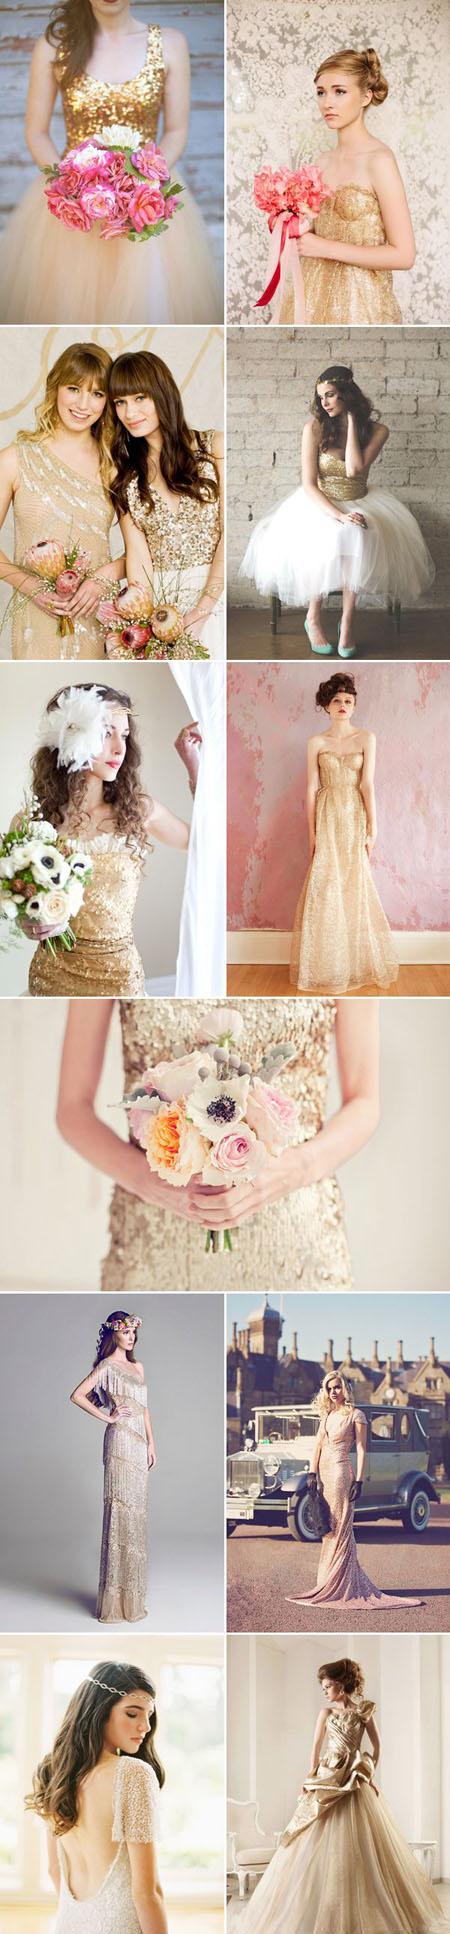 rochii mireasa aurii